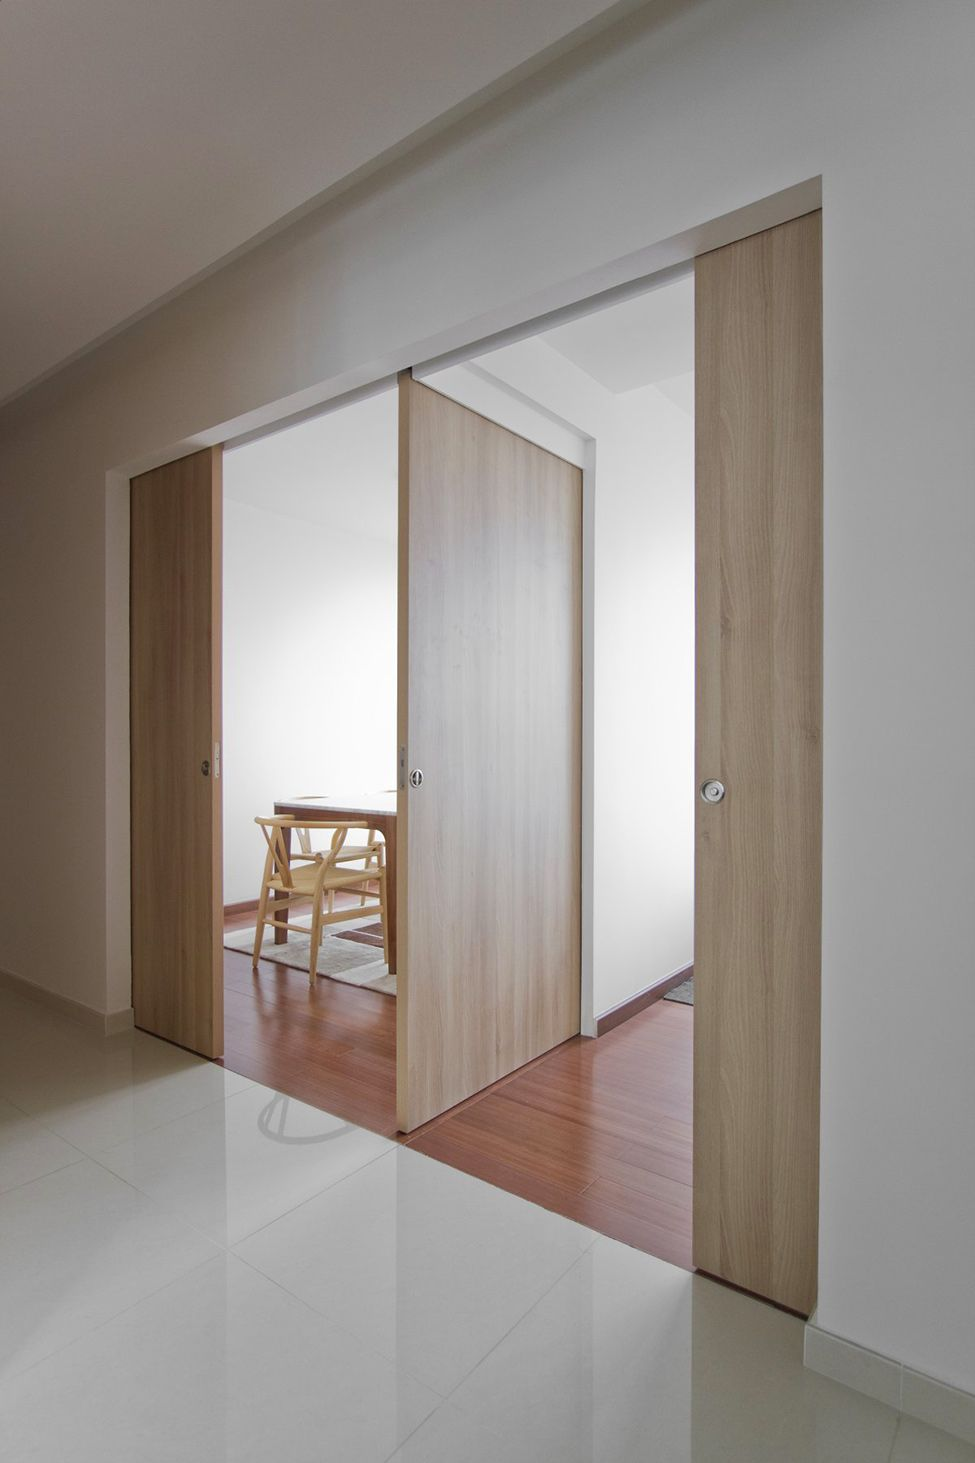 Architect S Home In Singapore Natura Loft Apartment By Ao Studios Reformas Sliding Doors Sliding Barn Door Hardware Cavity Sliding Doors